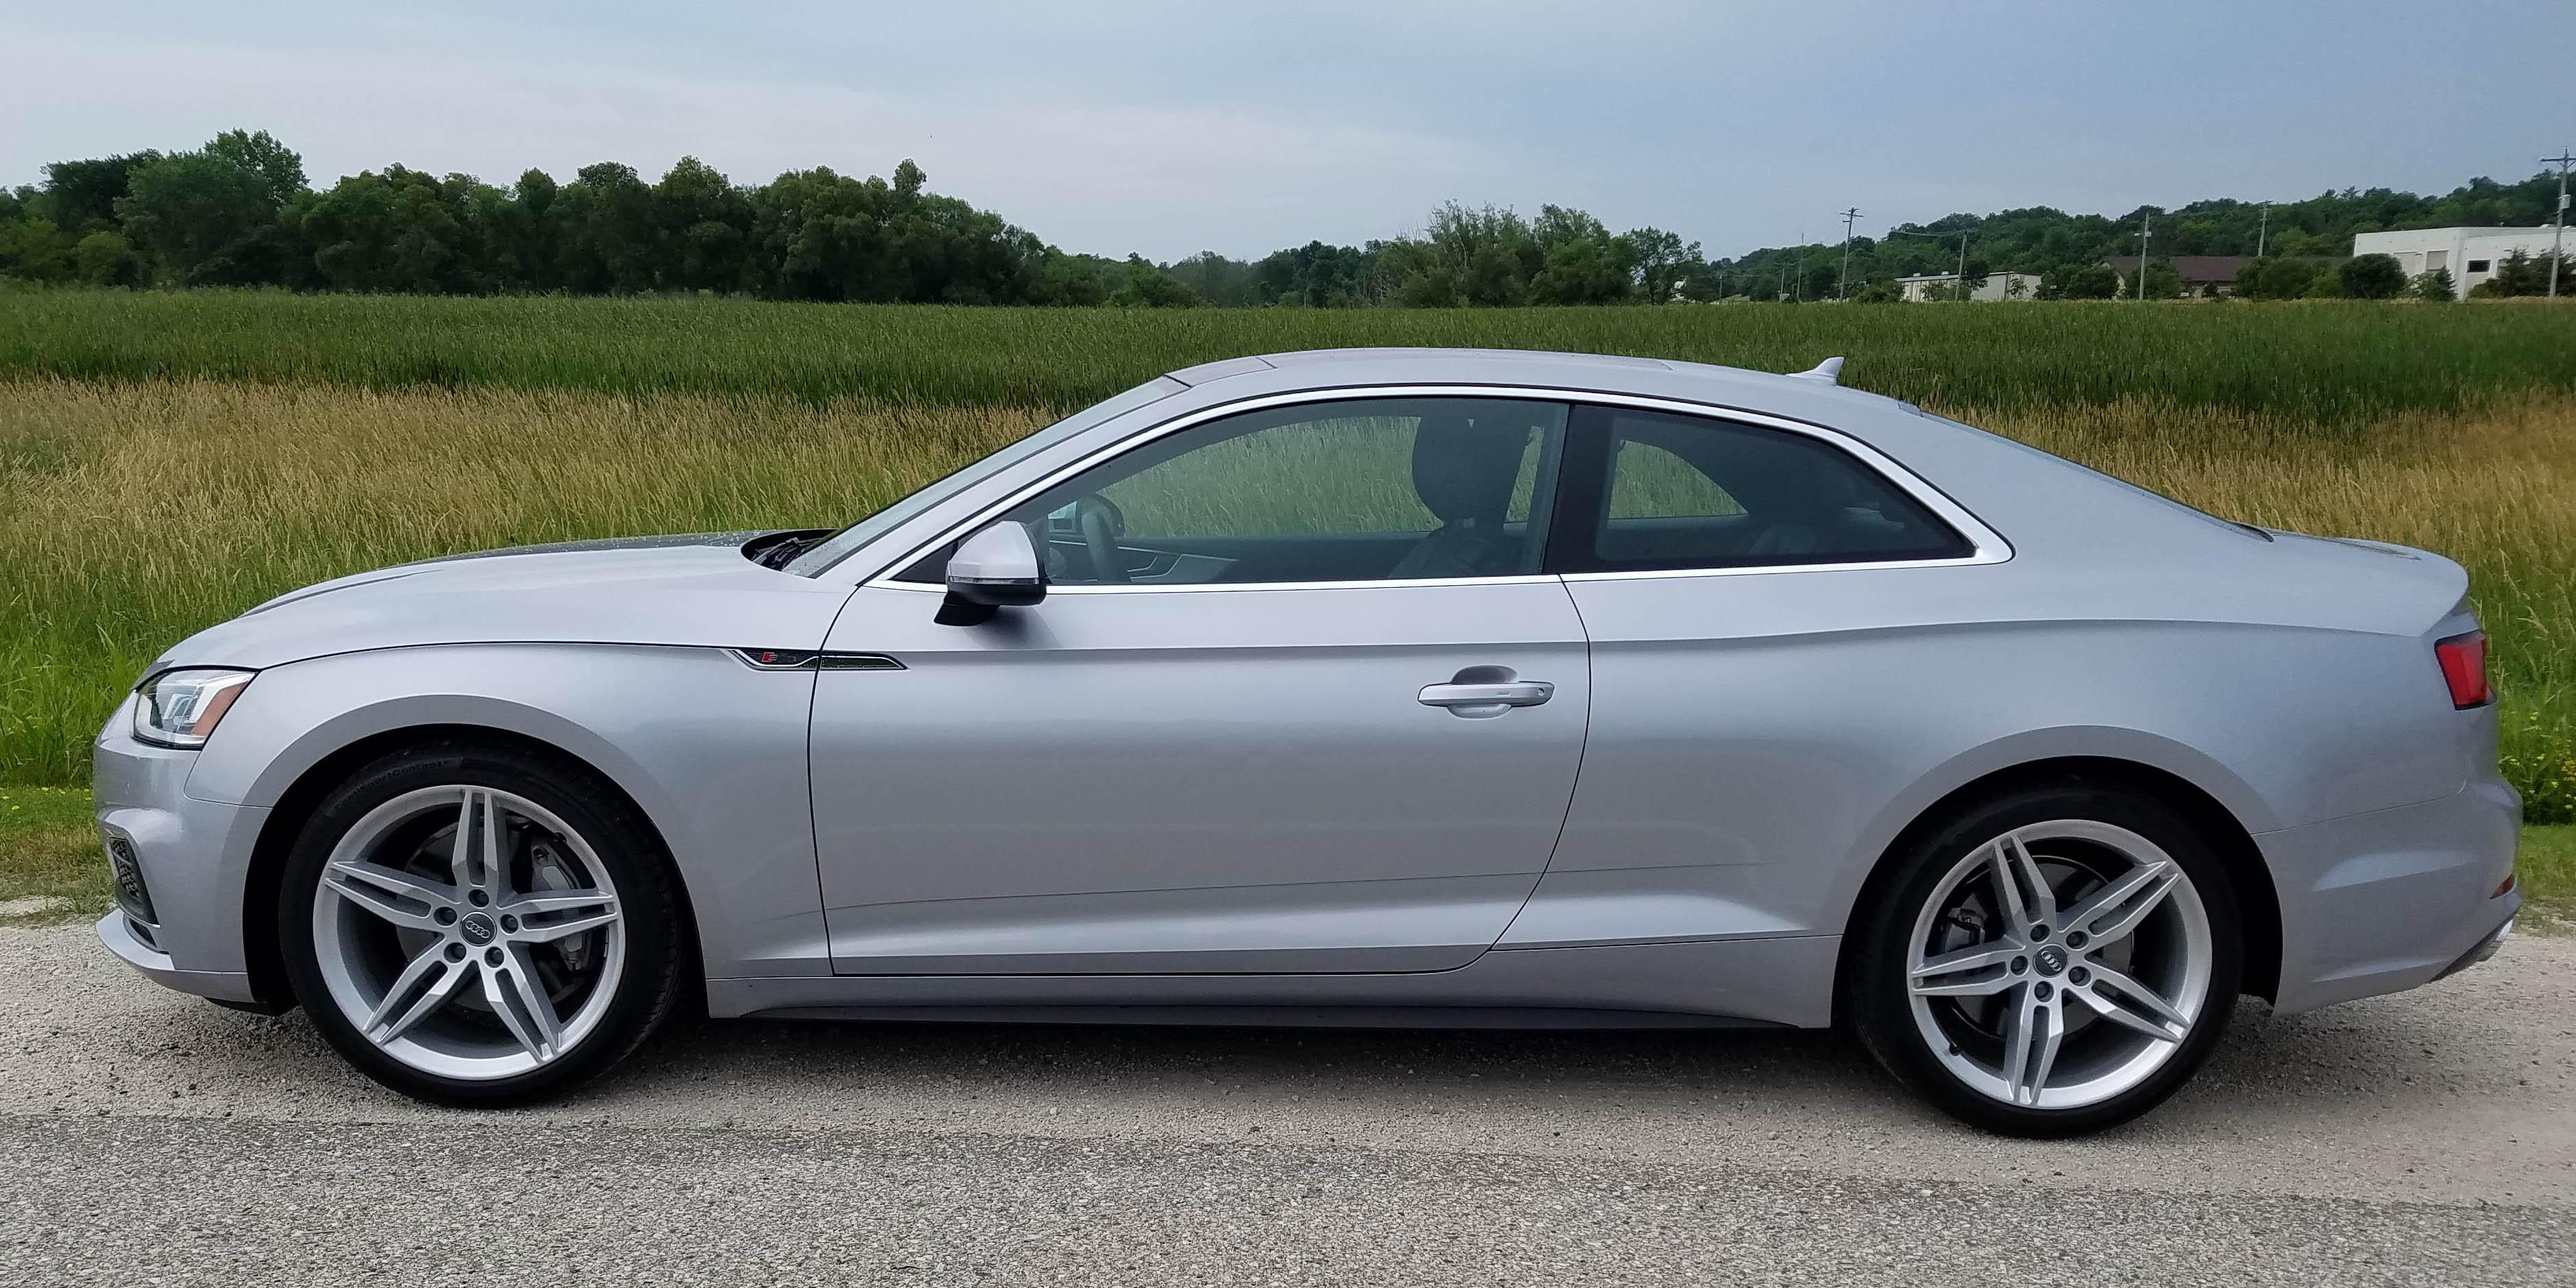 2018 Audi A5 Coupe 2.0T quattro | Savage On Wheels Silver Audi A on audi a3 cabriolet silver, audi s5 silver, audi a4 silver, audi q5 silver, audi s3 silver, audi ice silver, audi s6 silver, volkswagen jetta silver, audi q7 silver, lexus es350 silver, volkswagen gti silver, audi rs5 silver, audi a8 silver, audi sq5 silver, audi tt silver, lincoln mkz hybrid silver, skoda yeti silver, audi a7 silver, toyota land cruiser silver, audi sports car silver,